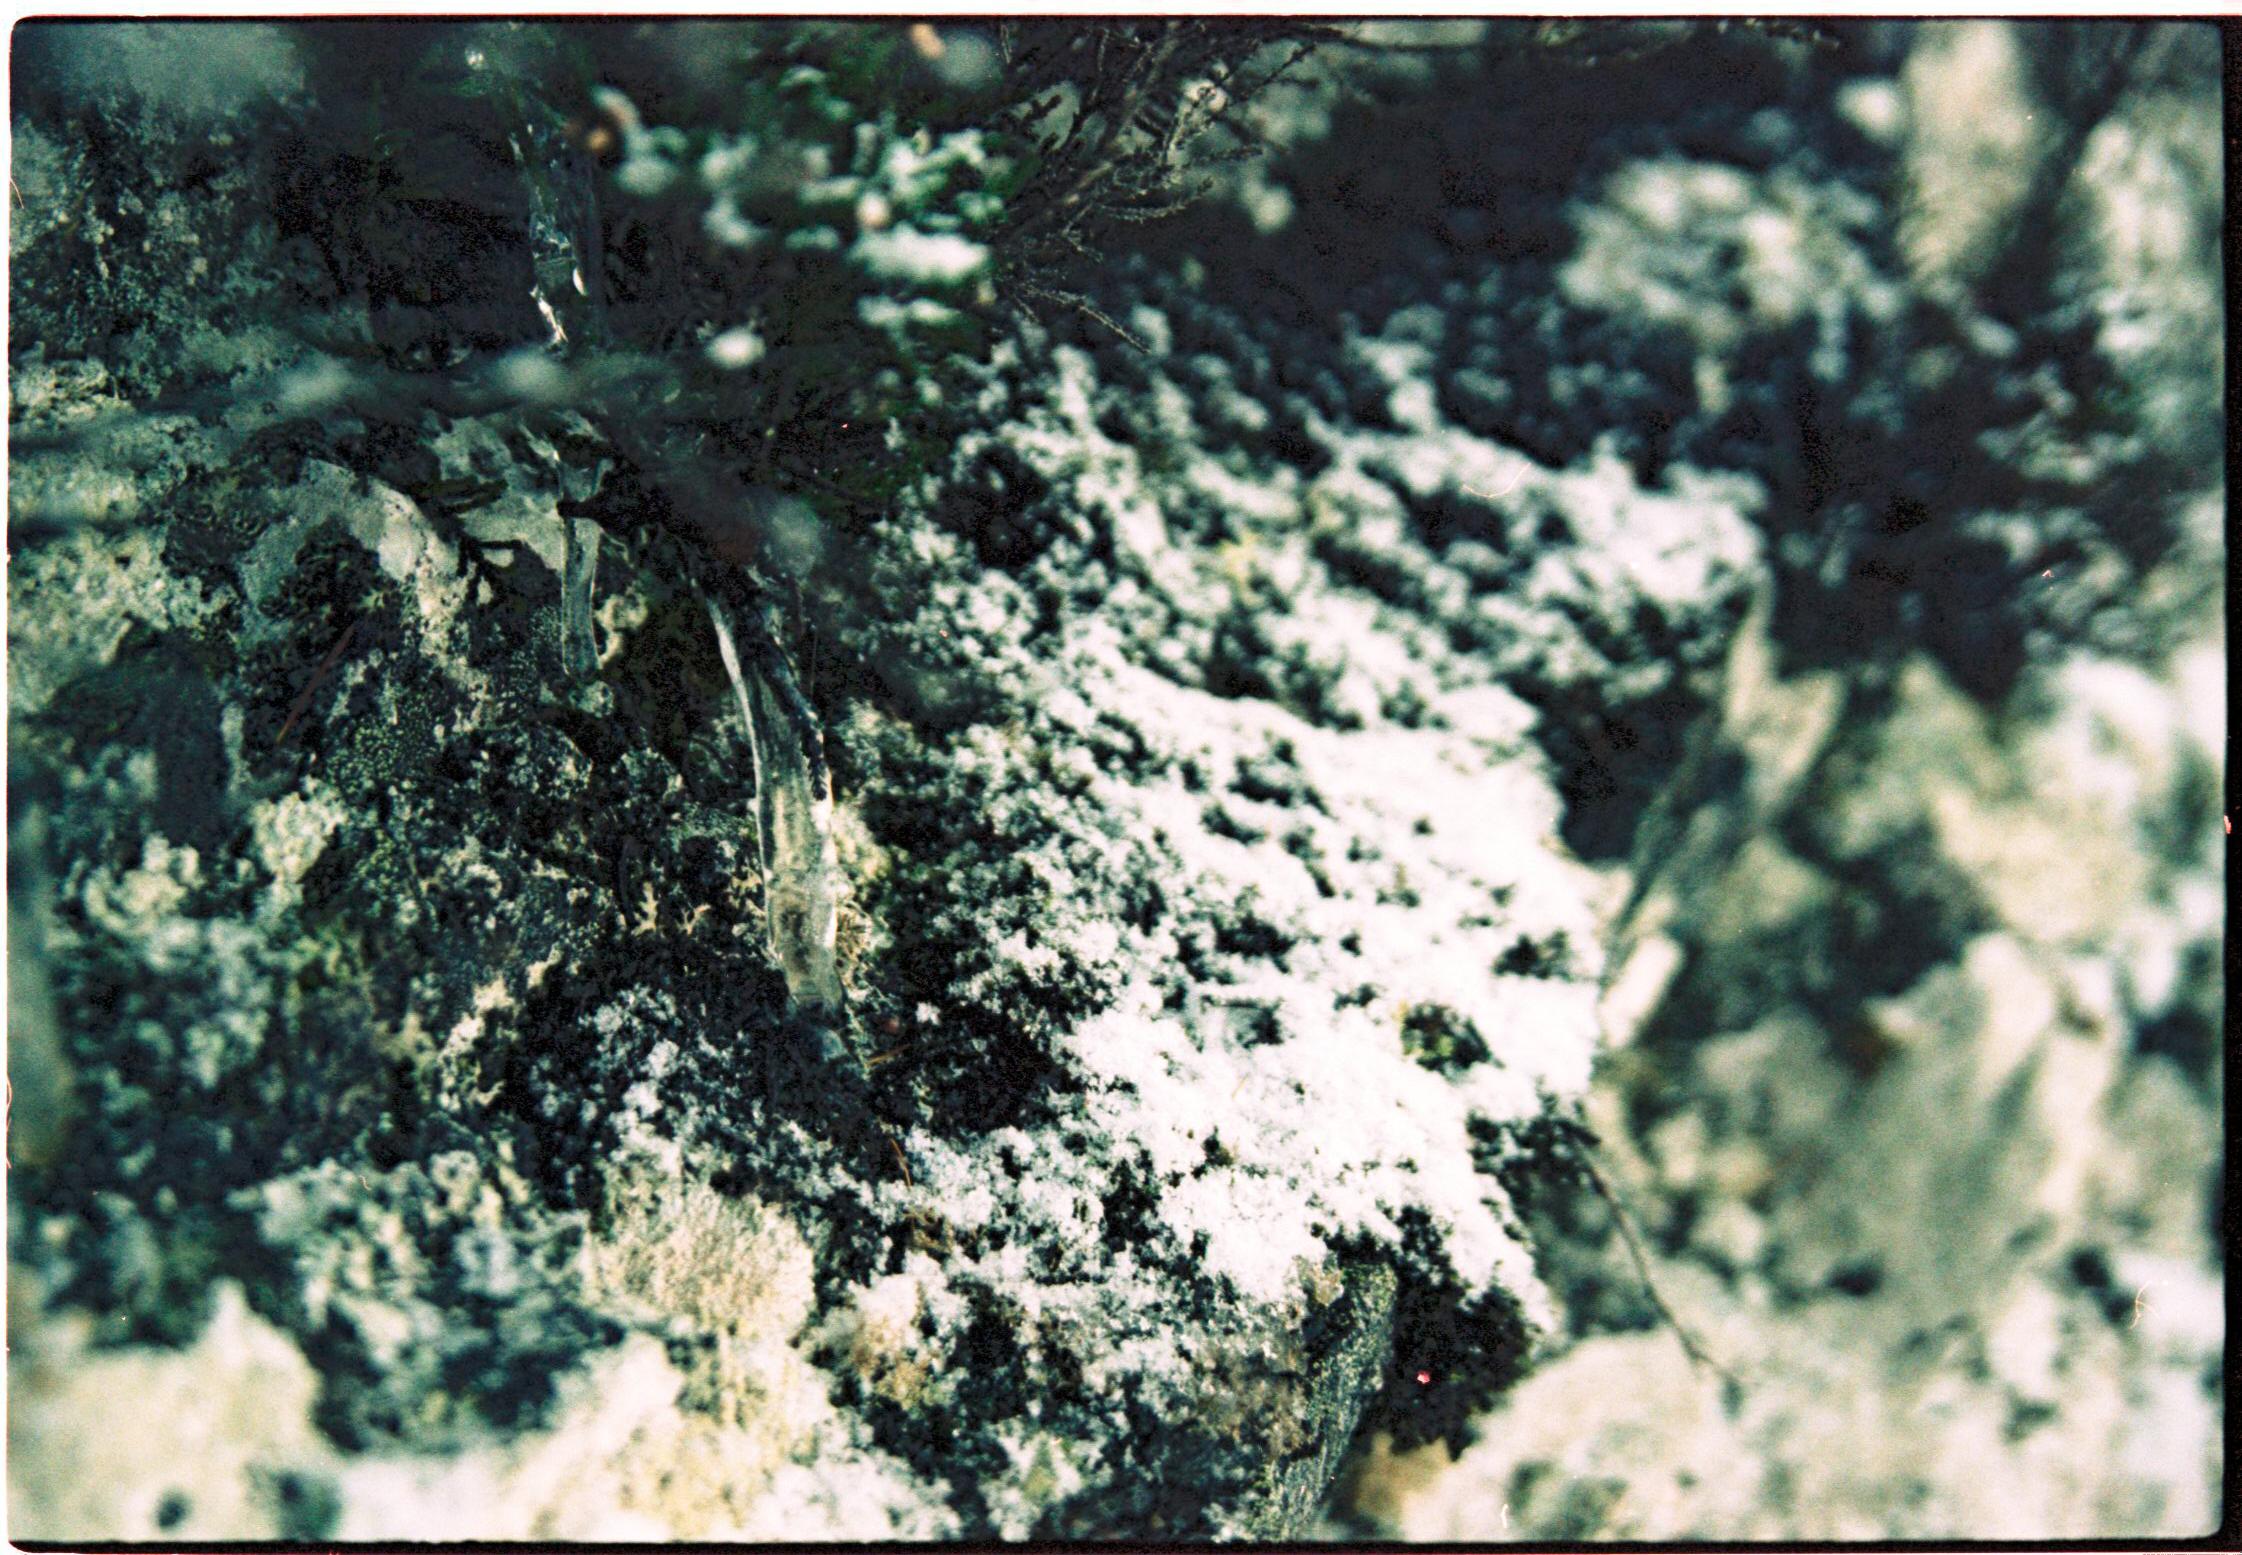 <p><strong>Inshriach 3            35 Euro</strong><br />Epsonprint on Hanhemulhe paper Photo Rag 110 gr.<br/>21 x 14,8 cm</p>